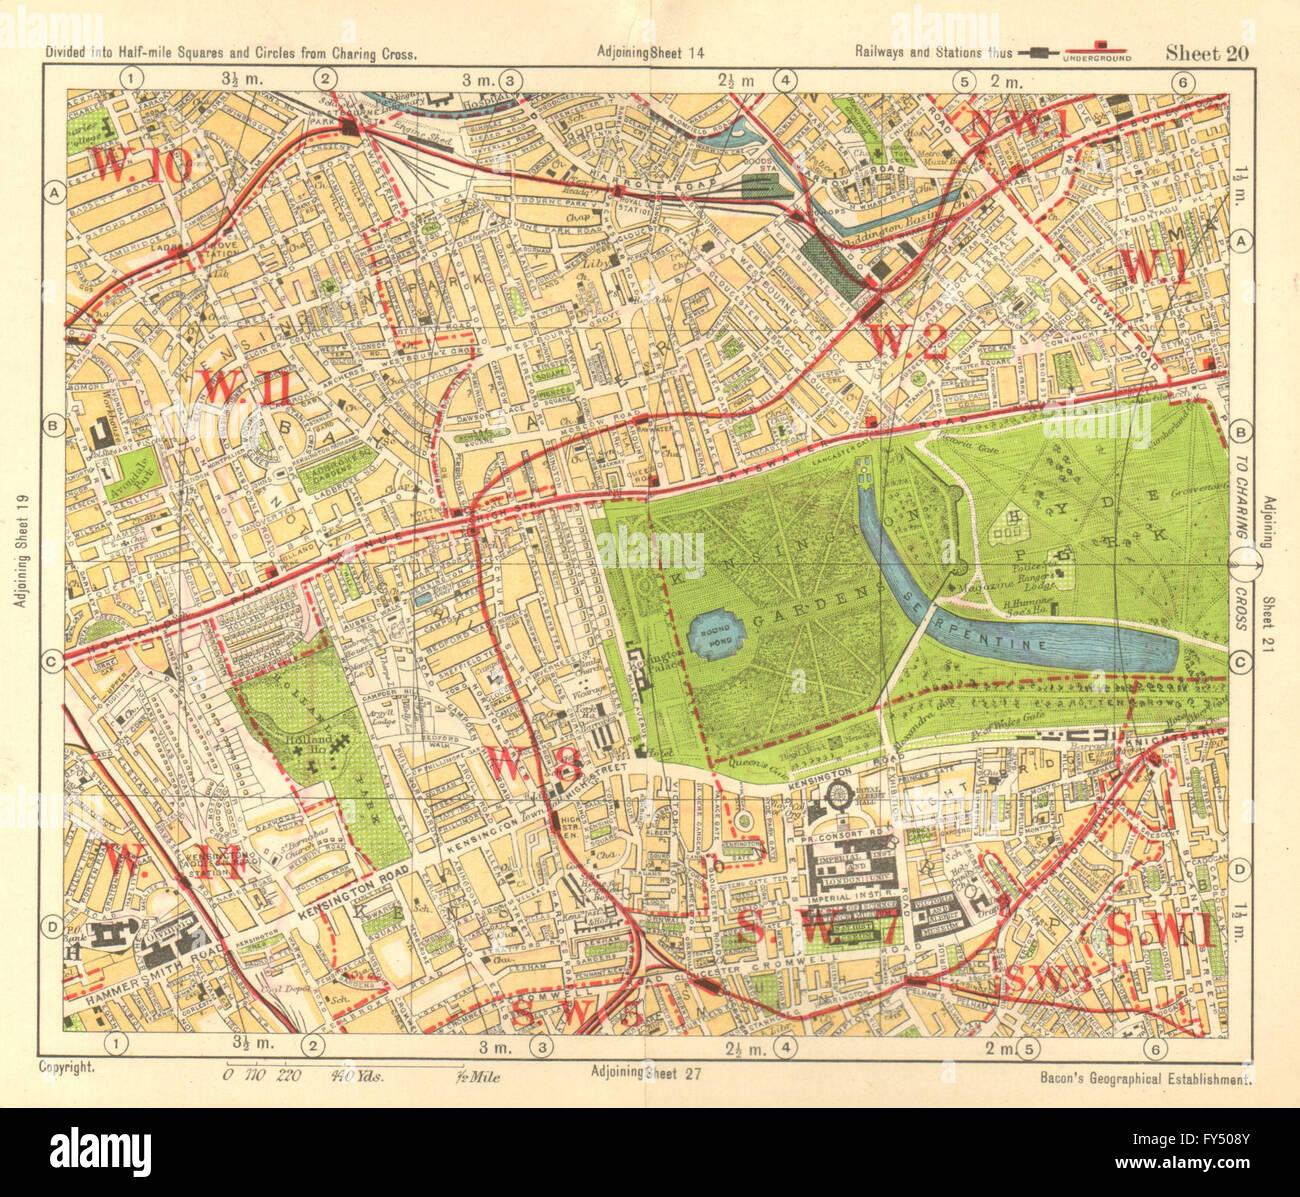 W LONDON Paddington South Kensington Bayswater Notting Hill